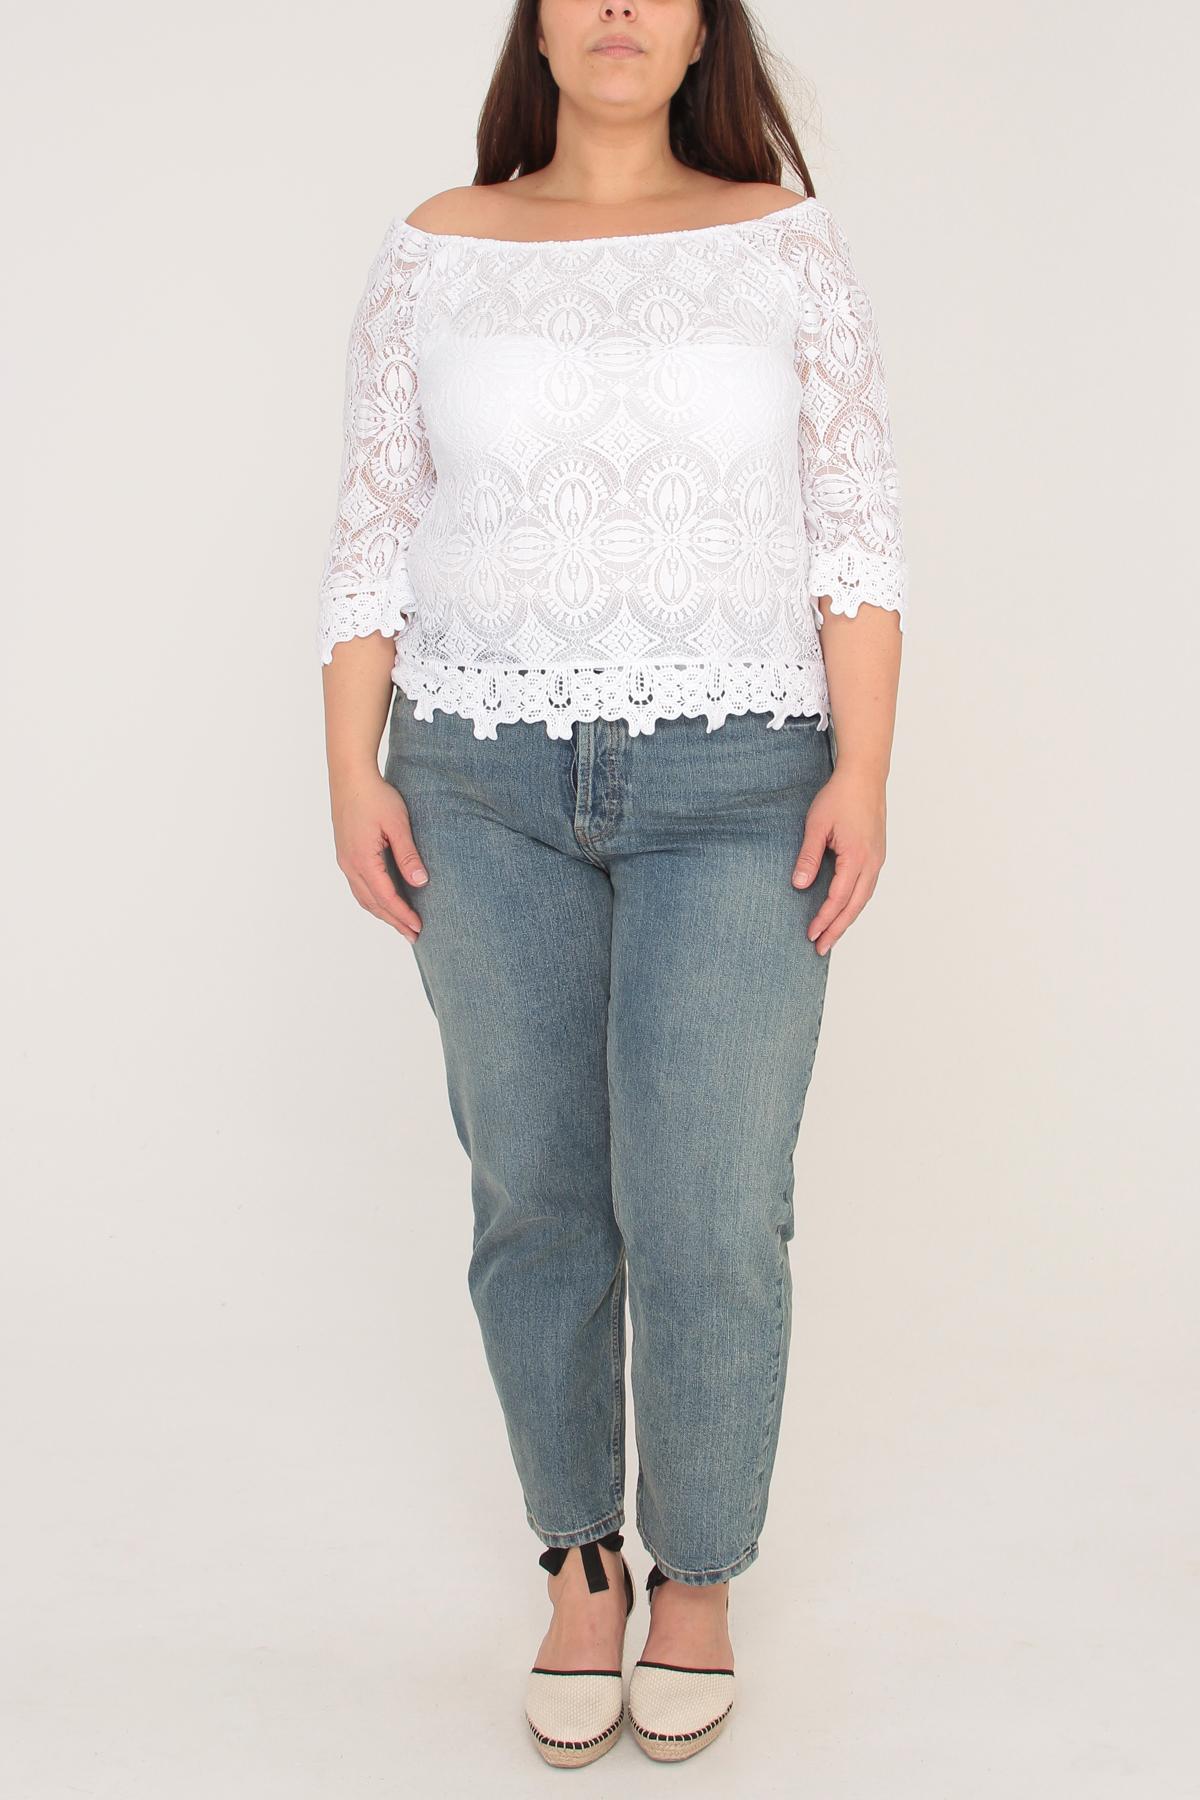 Tops Femme Blanc VETI STYLE 91002 #c eFashion Paris